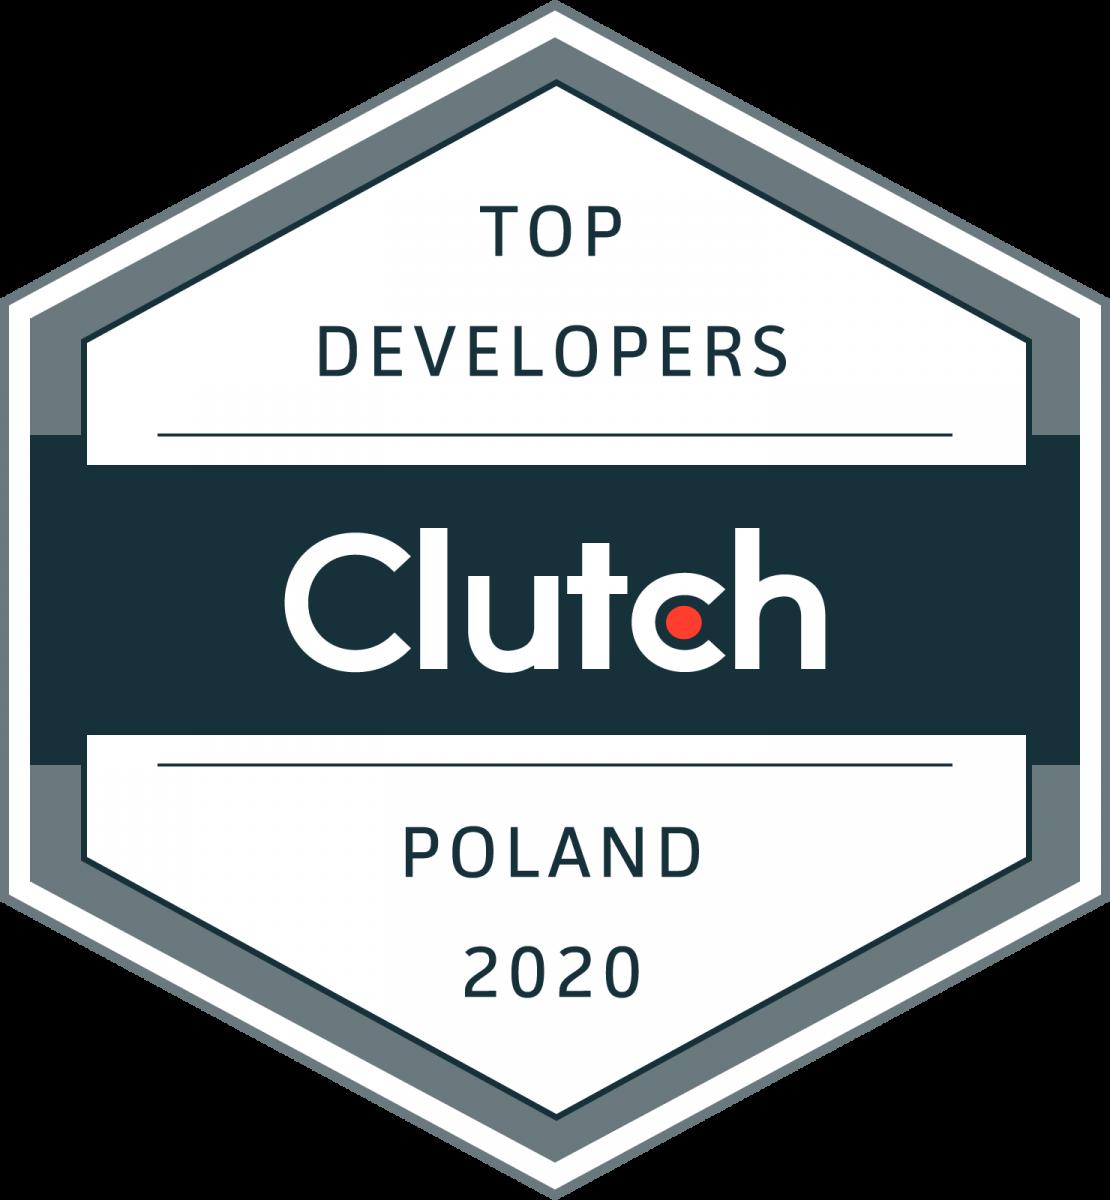 app developers Poland 2020